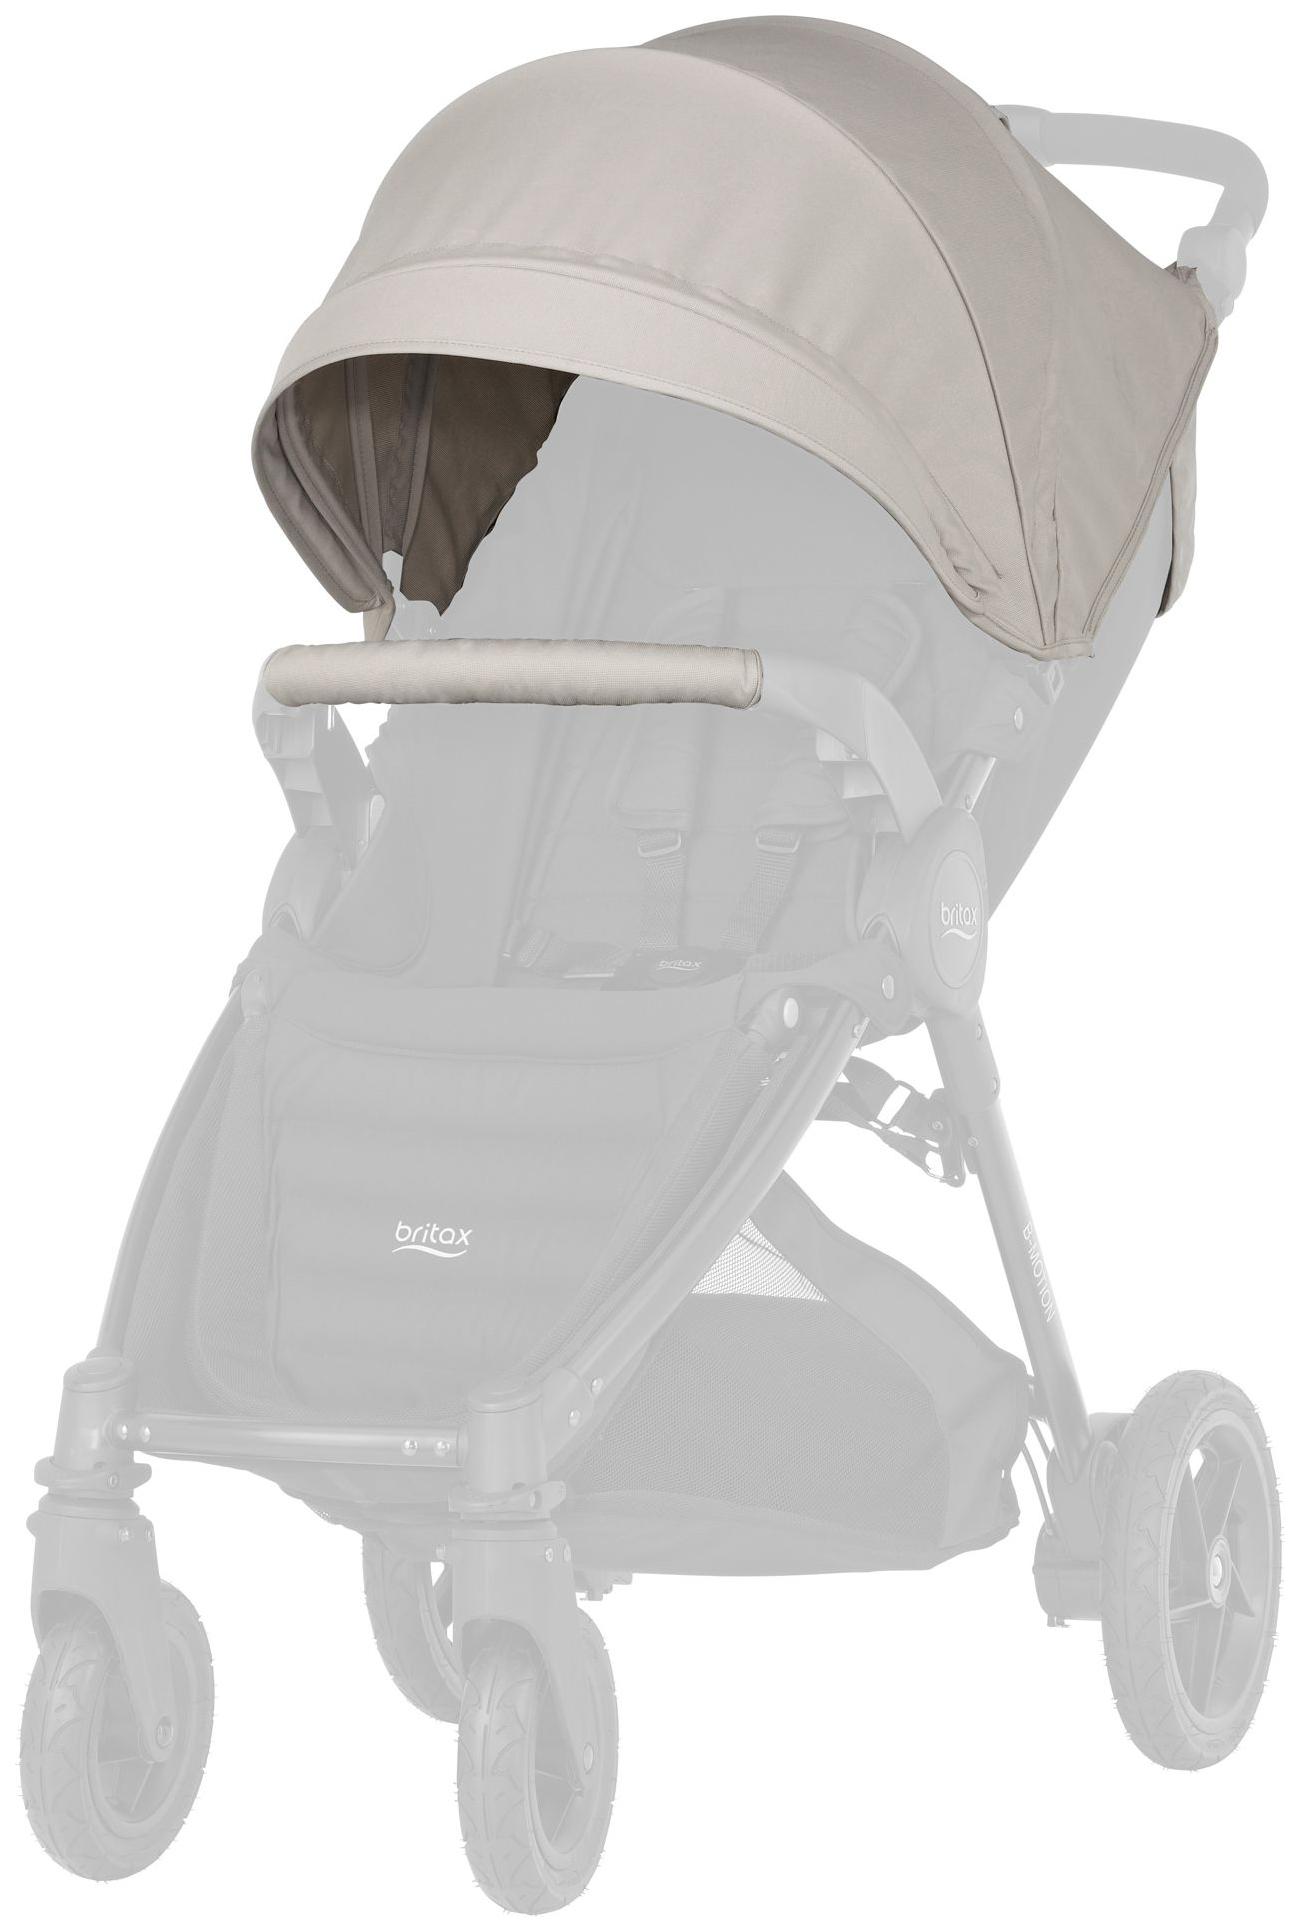 Купить Капюшон для коляски Britax Roemer Sand Beige B-Agile/ B-Motion 4 Plus, Britax Romer, Капюшоны на коляску